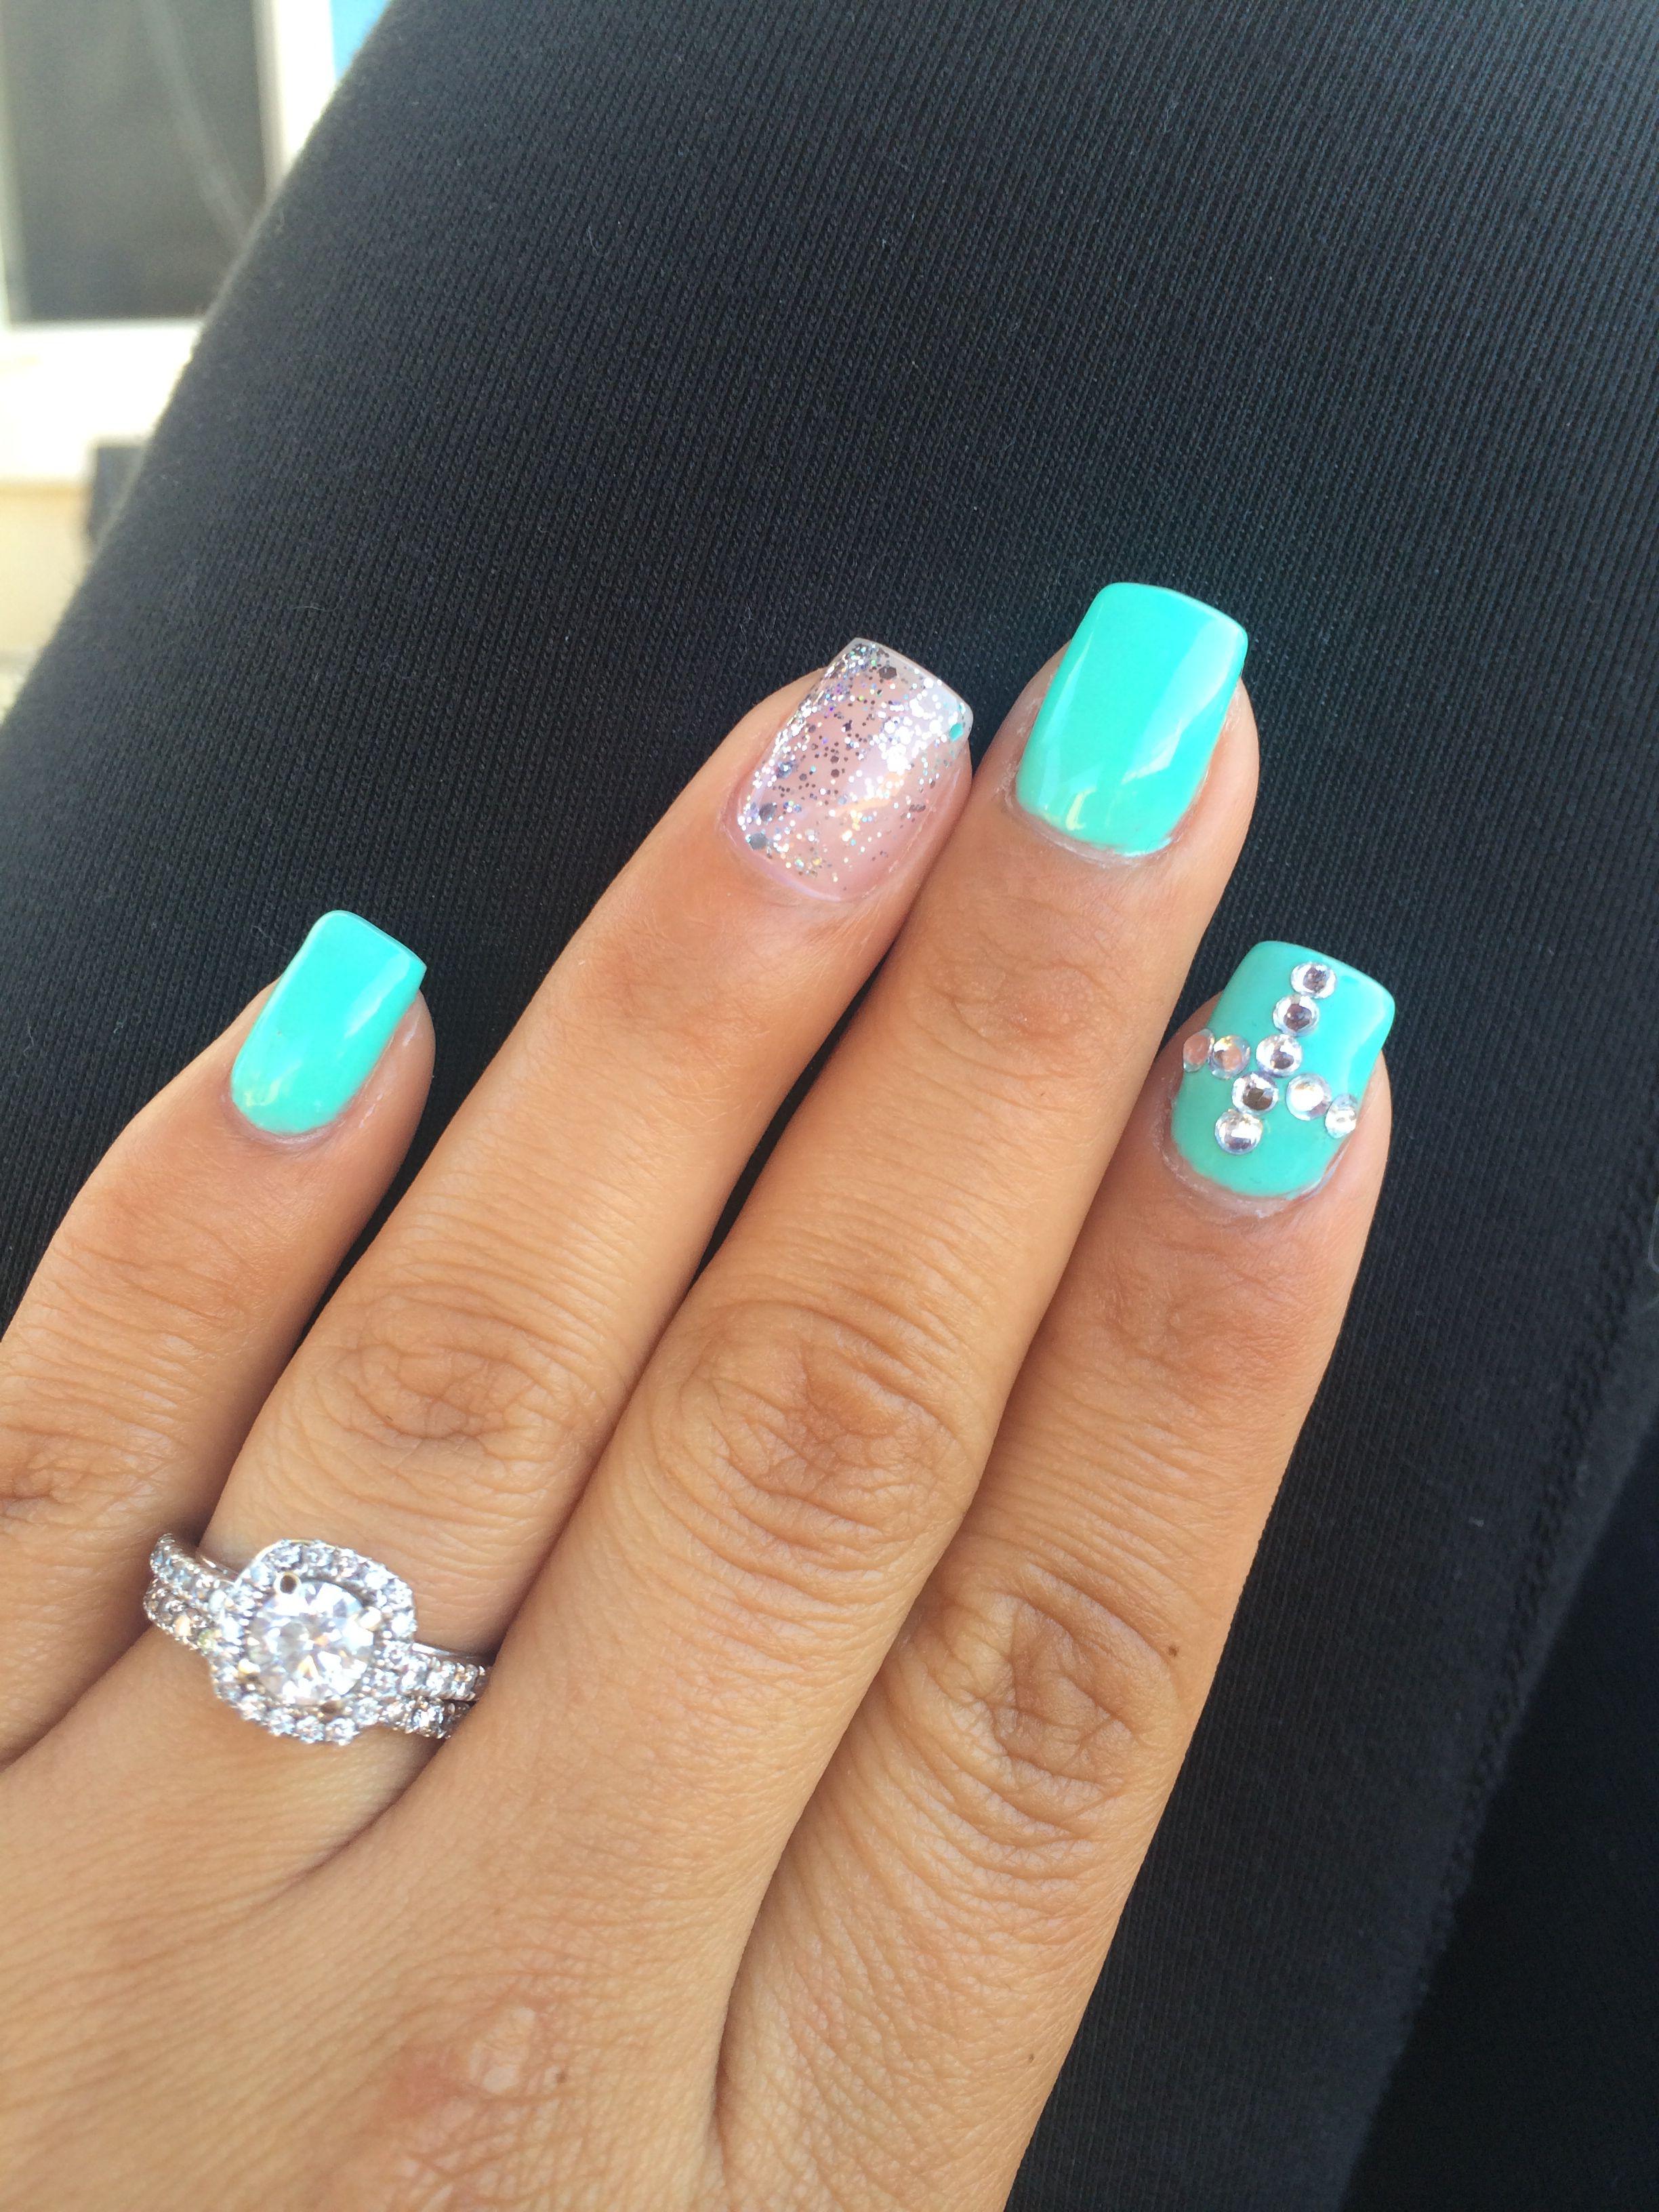 inspired gel nails. teal